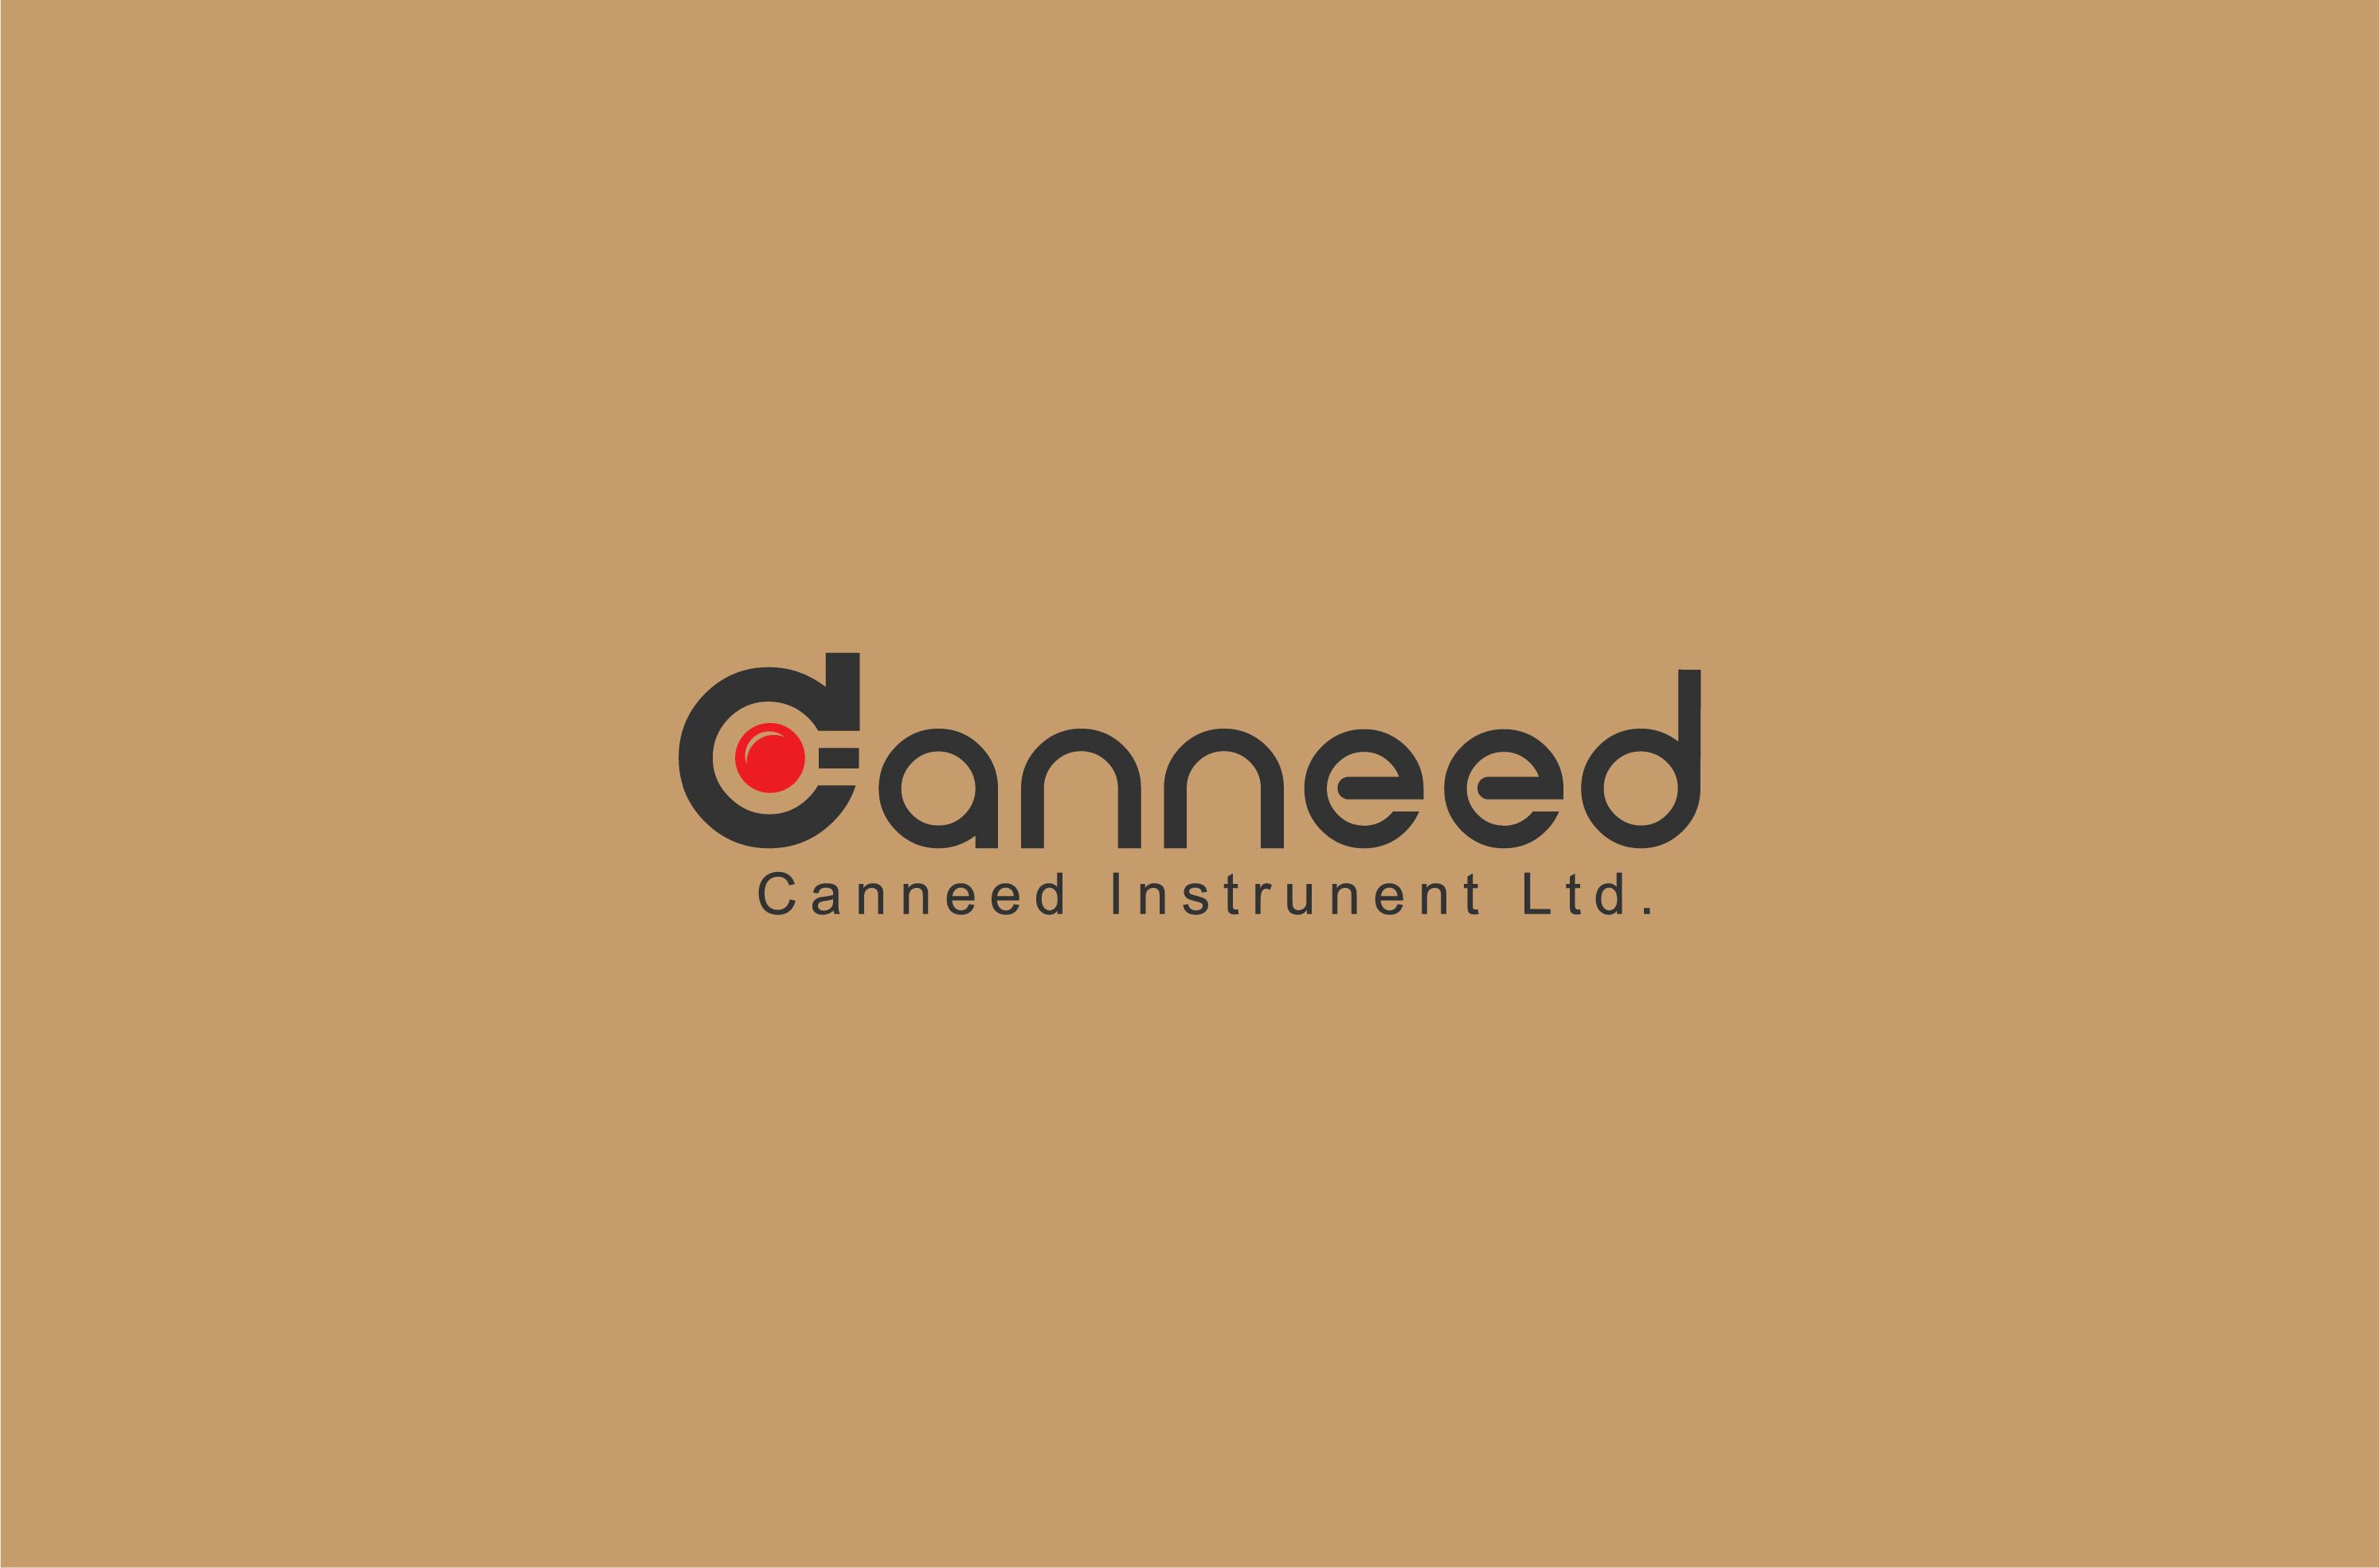 logo设计品牌产品公司企业餐饮店铺娱乐LOGO商标设计升级